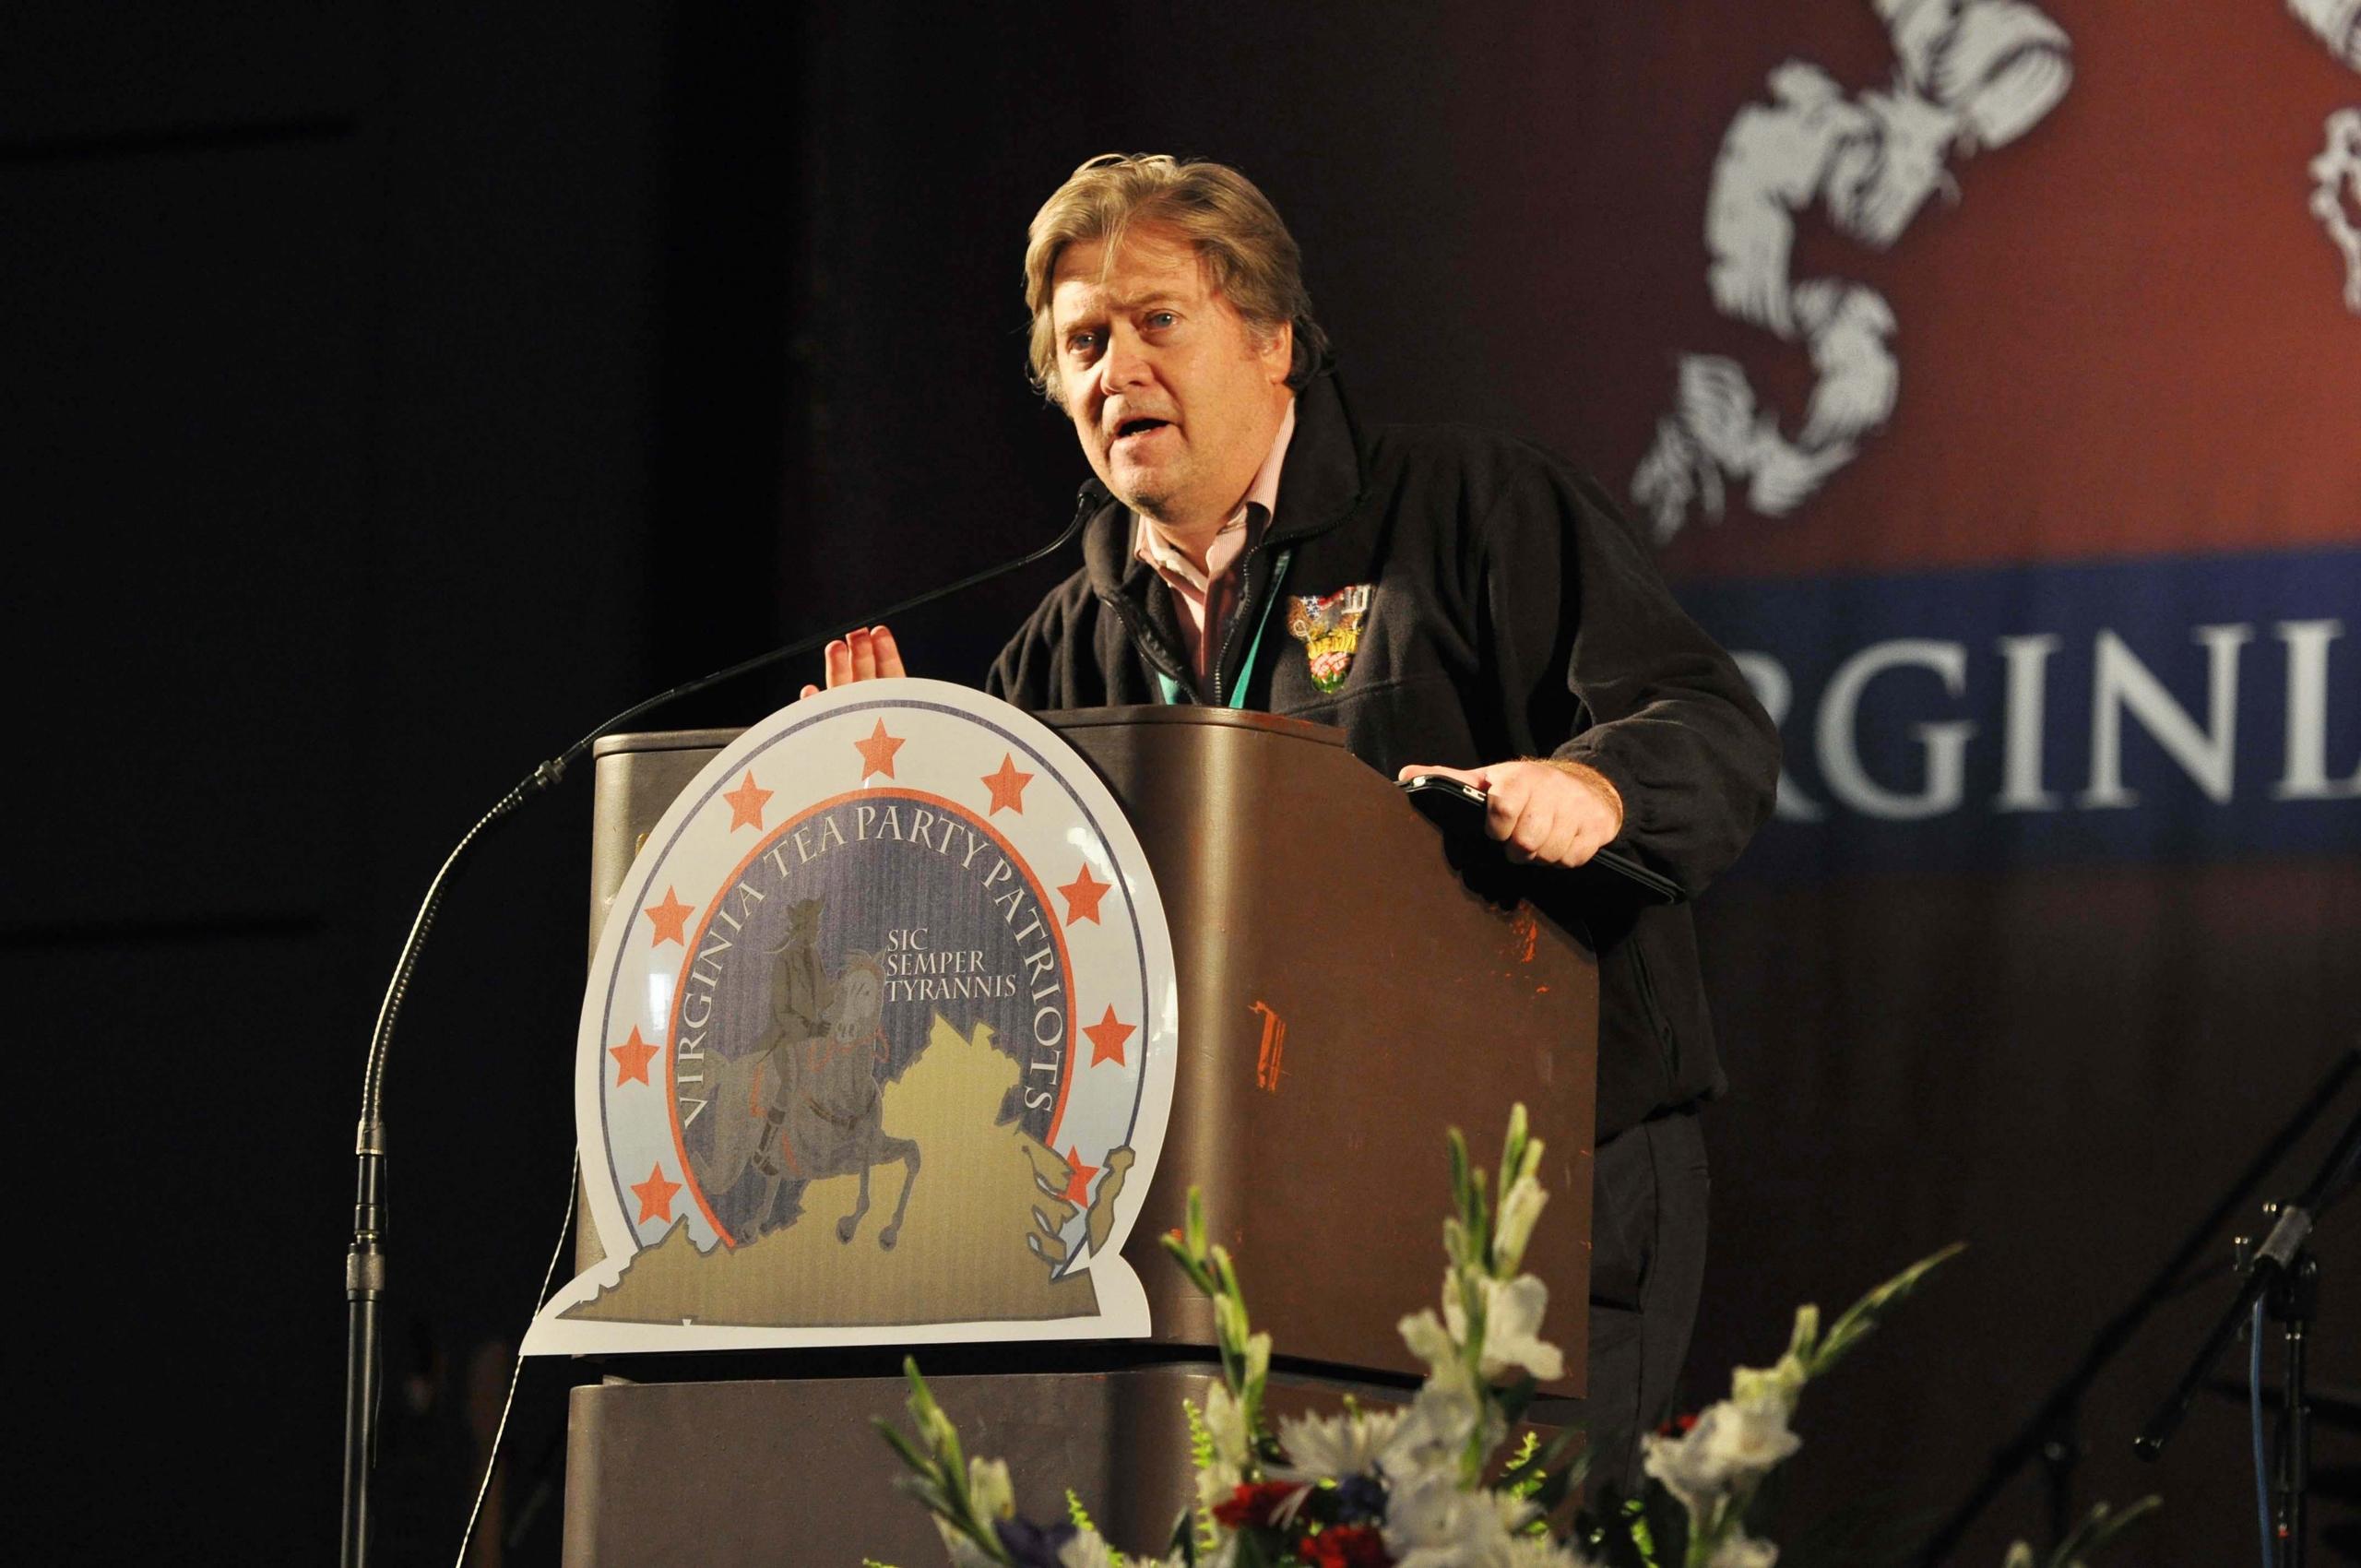 Award winning filmmaker Bannon introduces his Tea Party movie trilogy at the Virginia Tea Party Convention,Richmond, Va., Oct. 8, 2010.